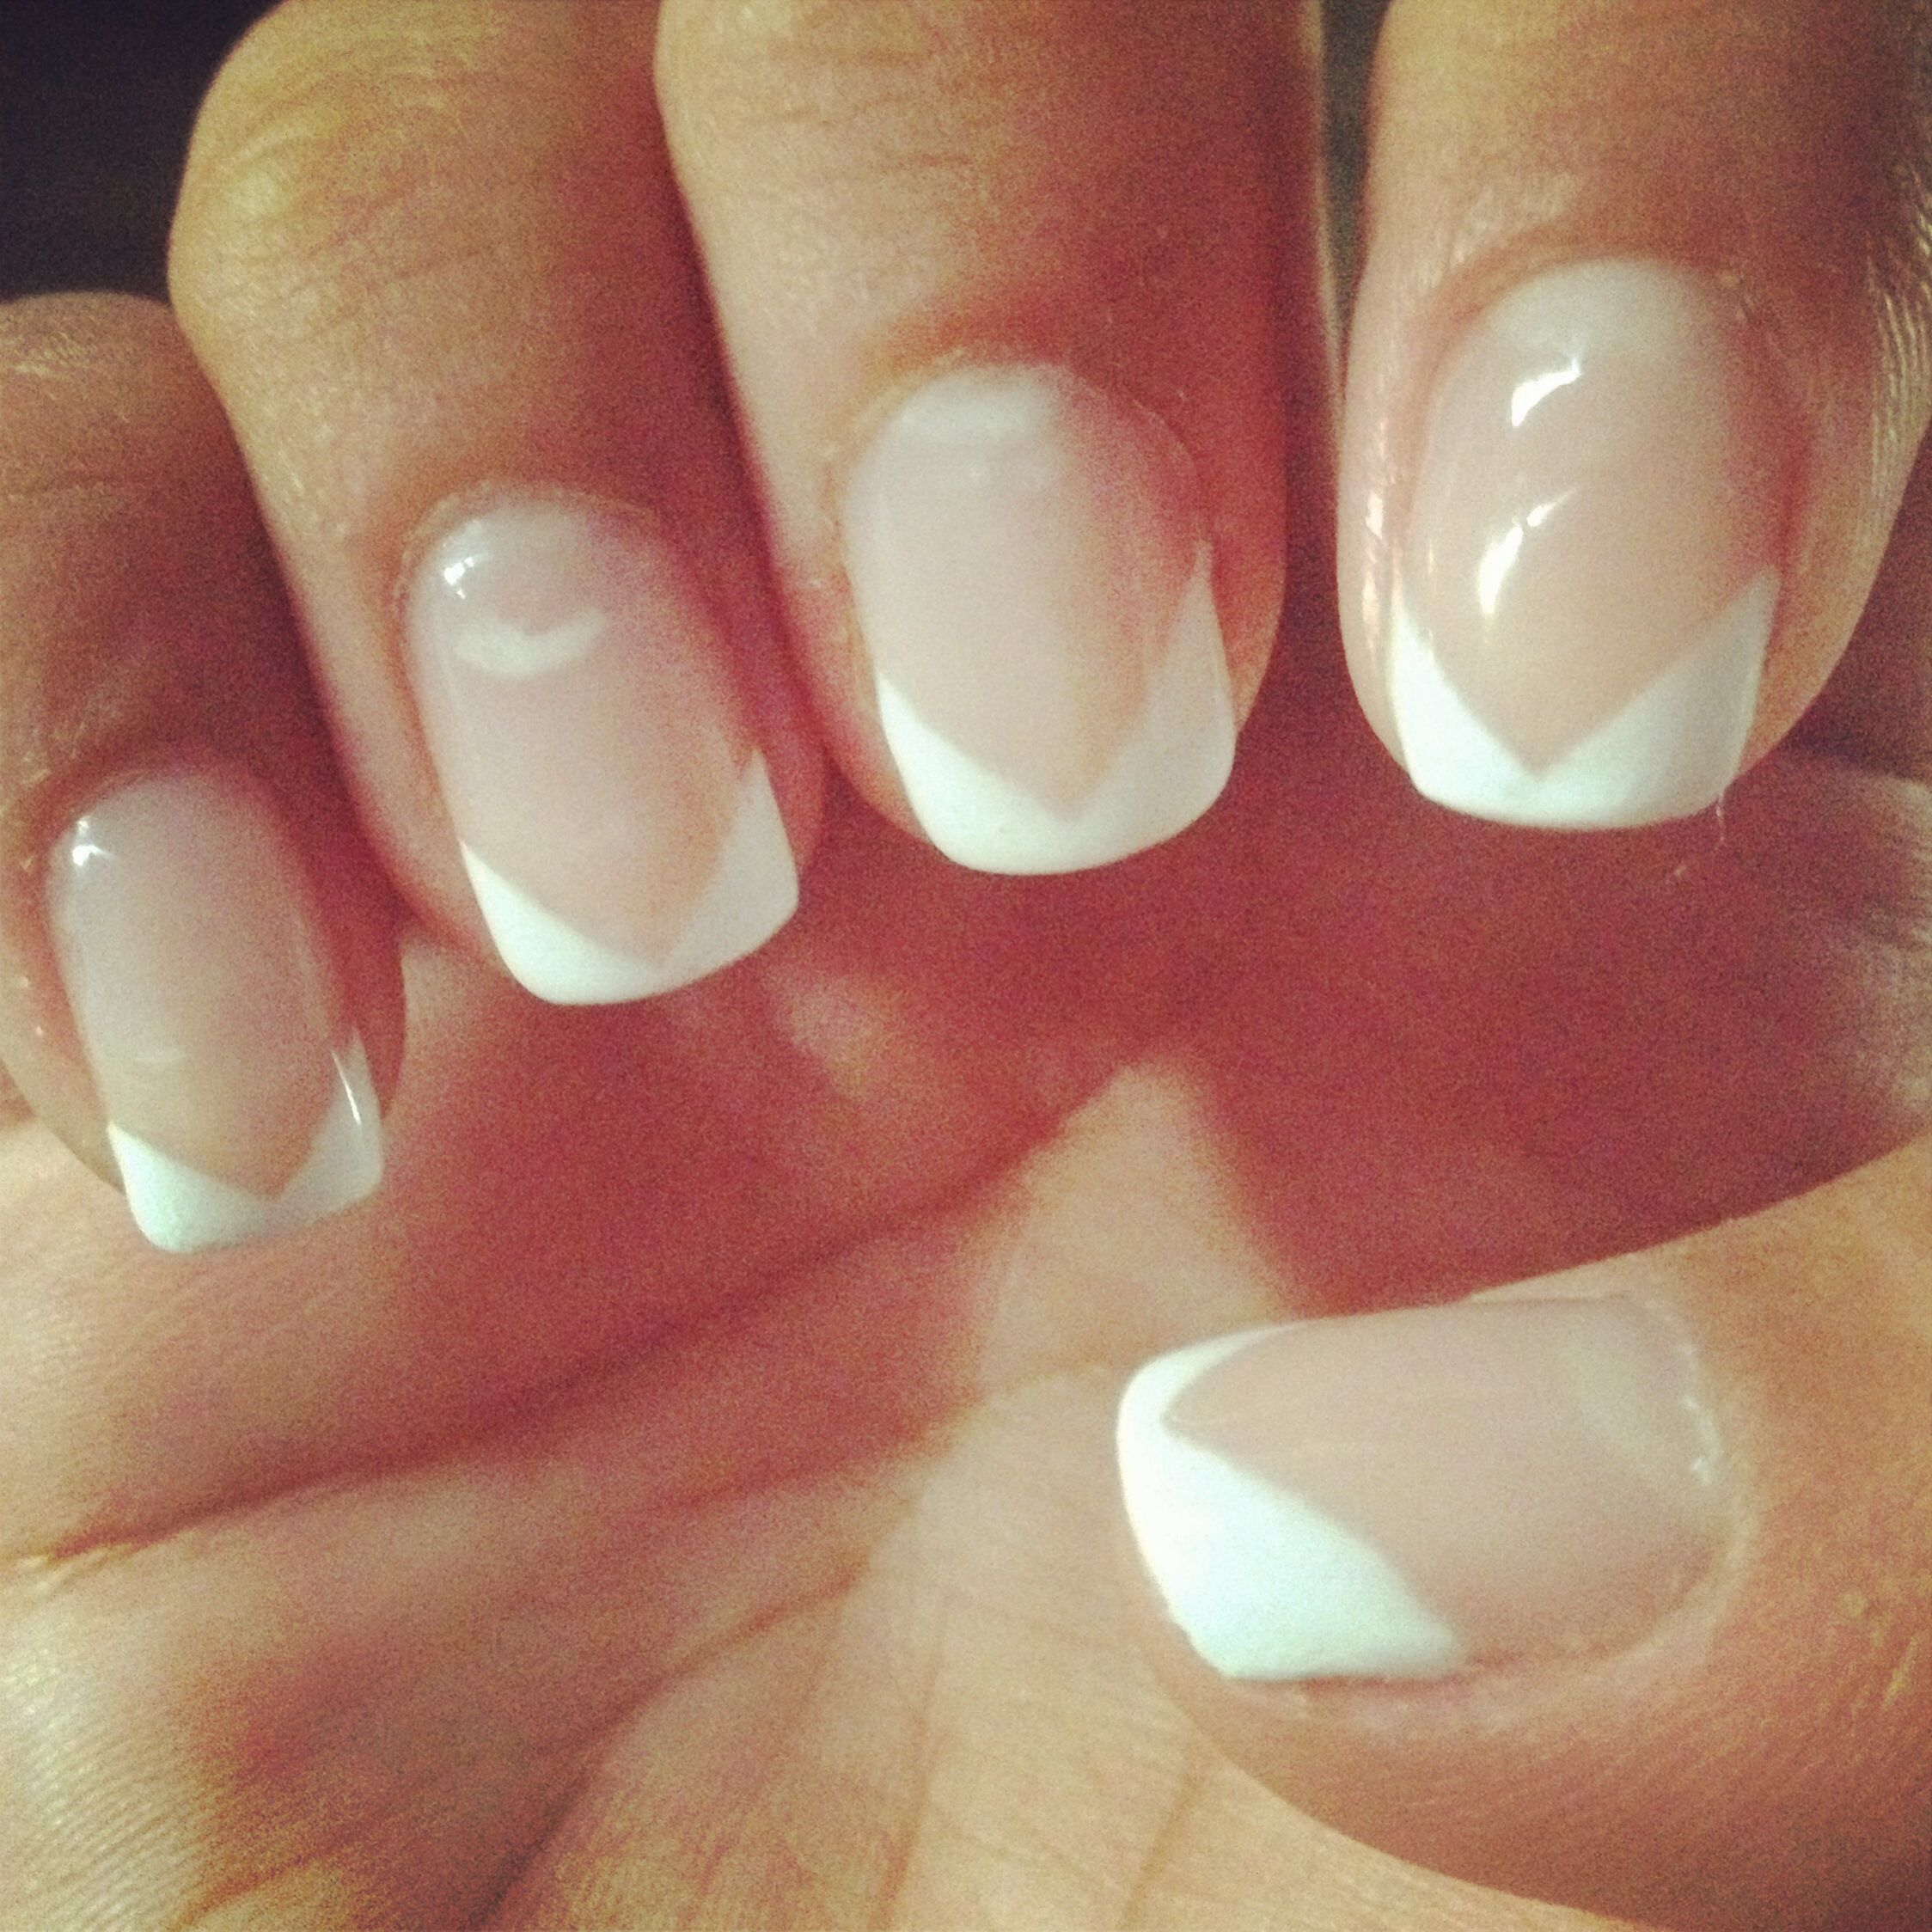 Gel Manicure V Shape French French Manicure Nail Designs Manicure Nail Designs French Manicure Nails